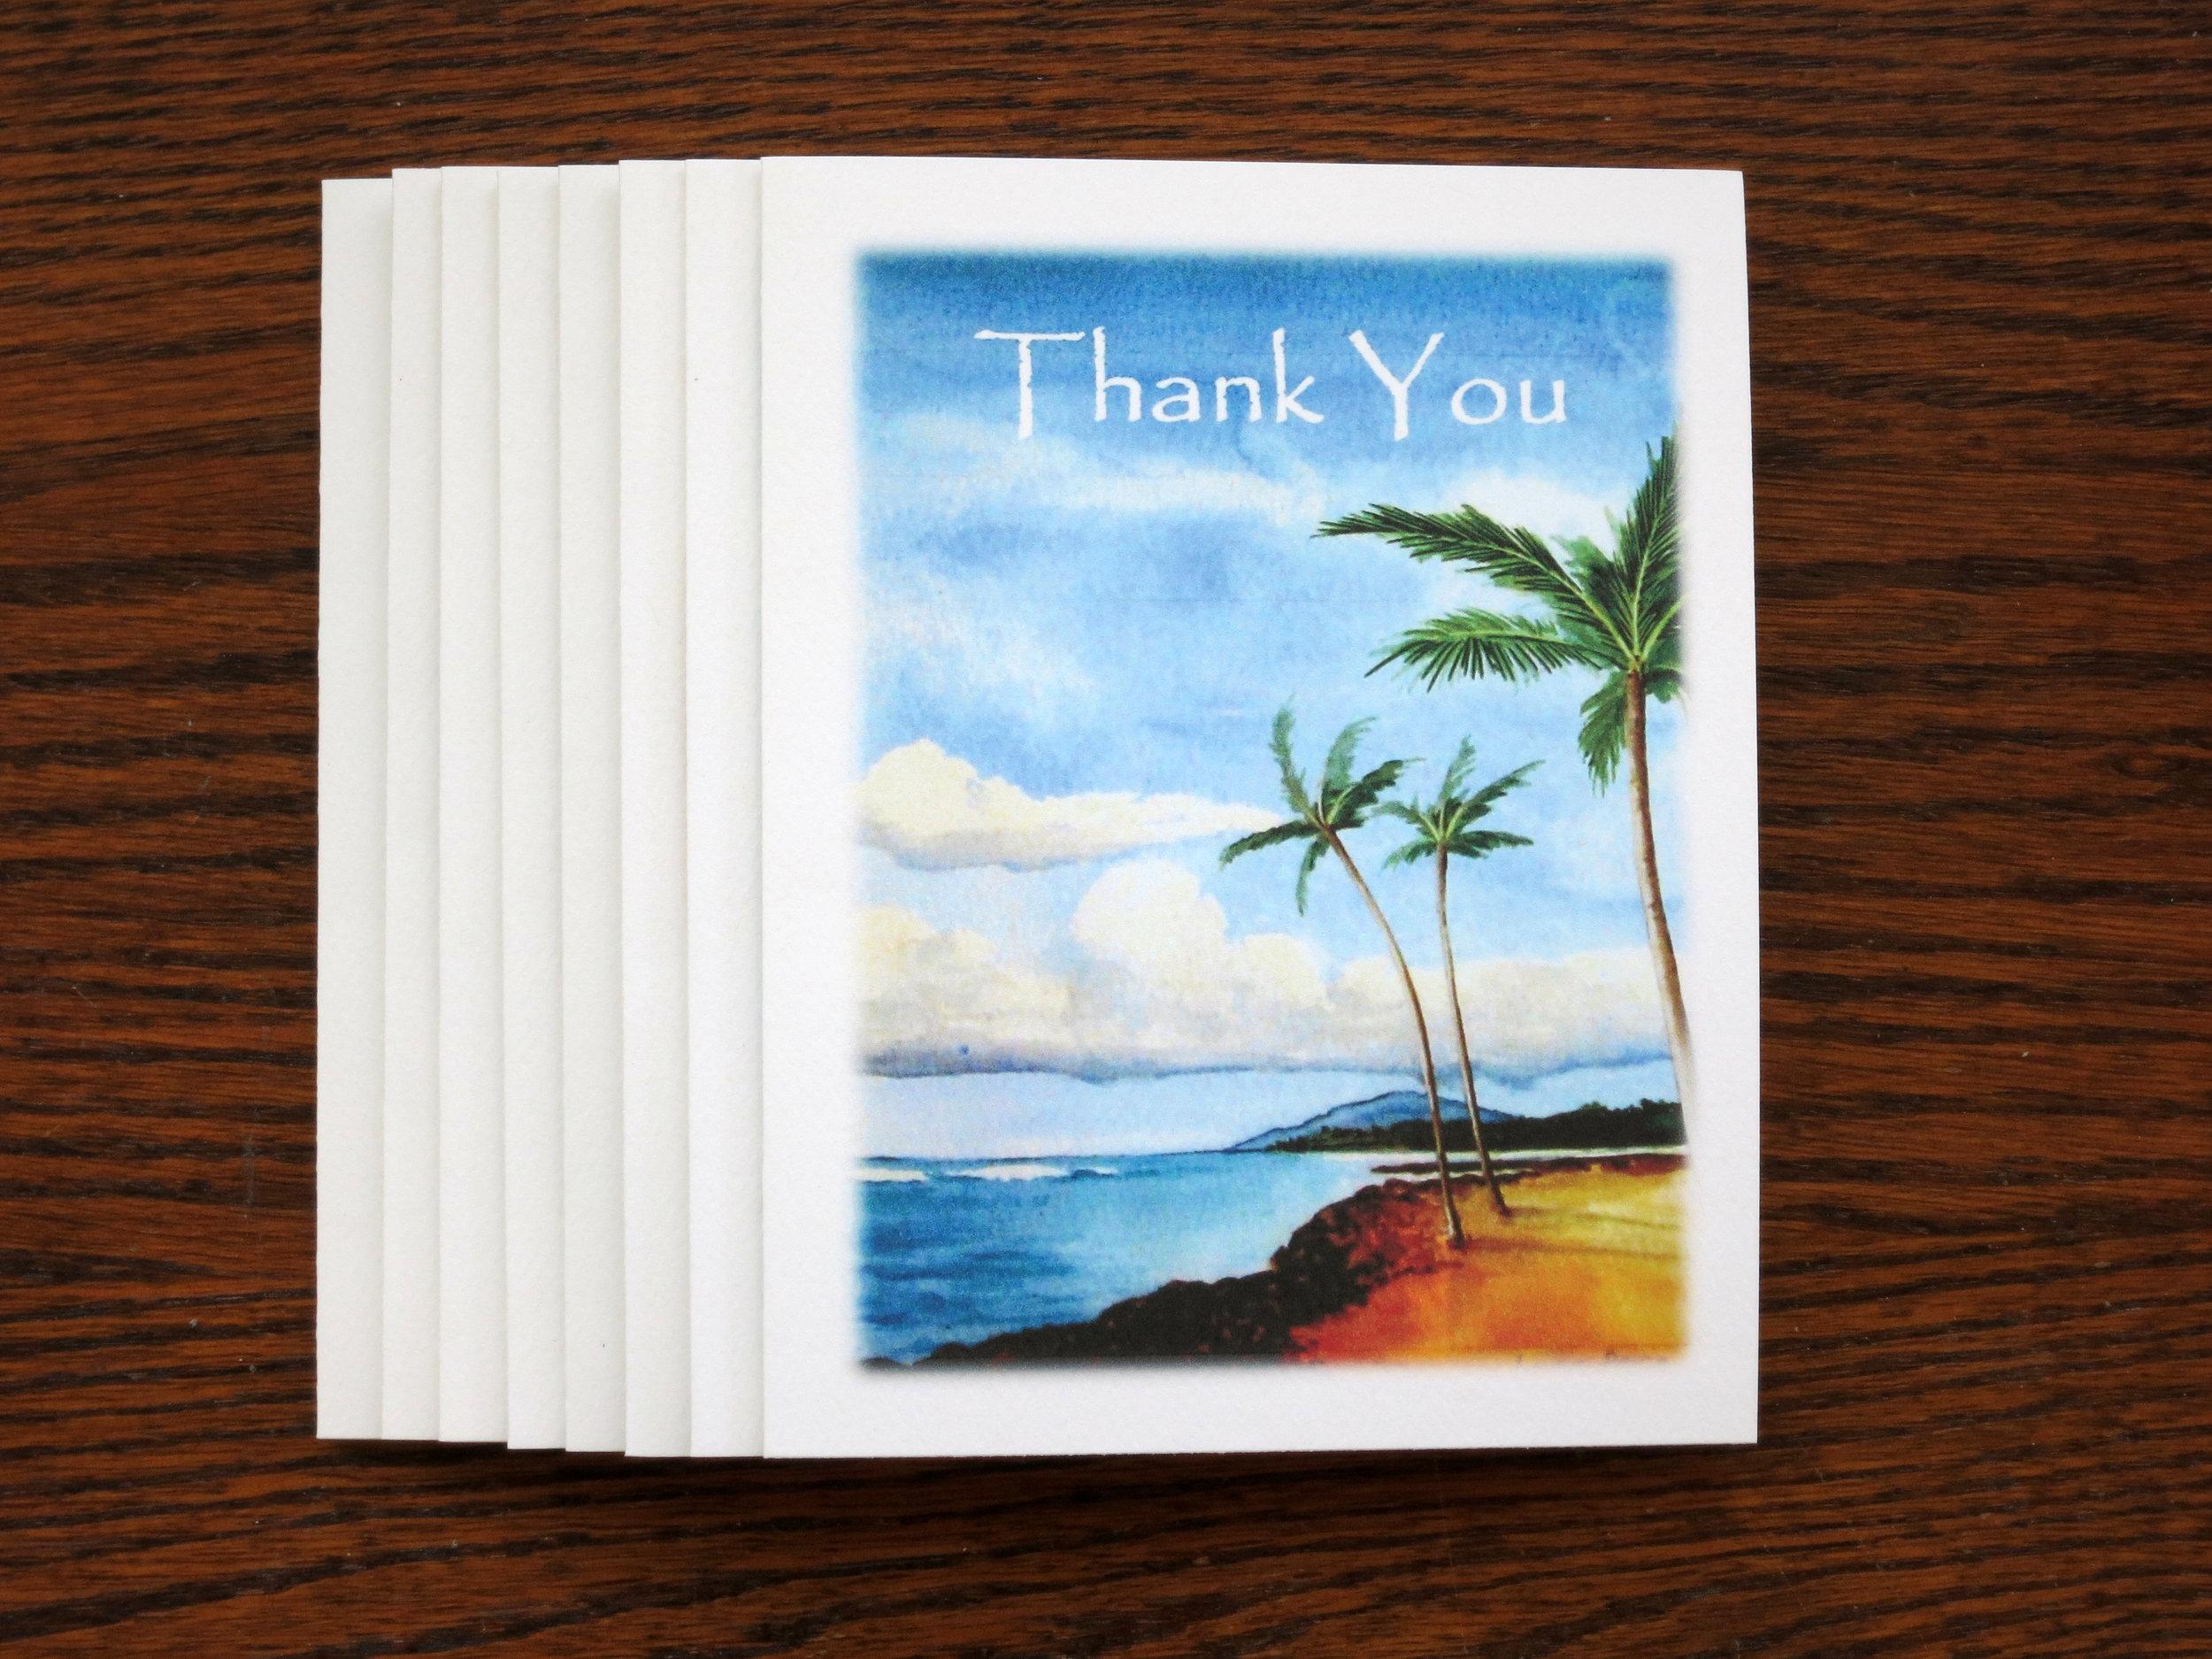 BEACH THANK YOU - 8 Cards - Blank inside